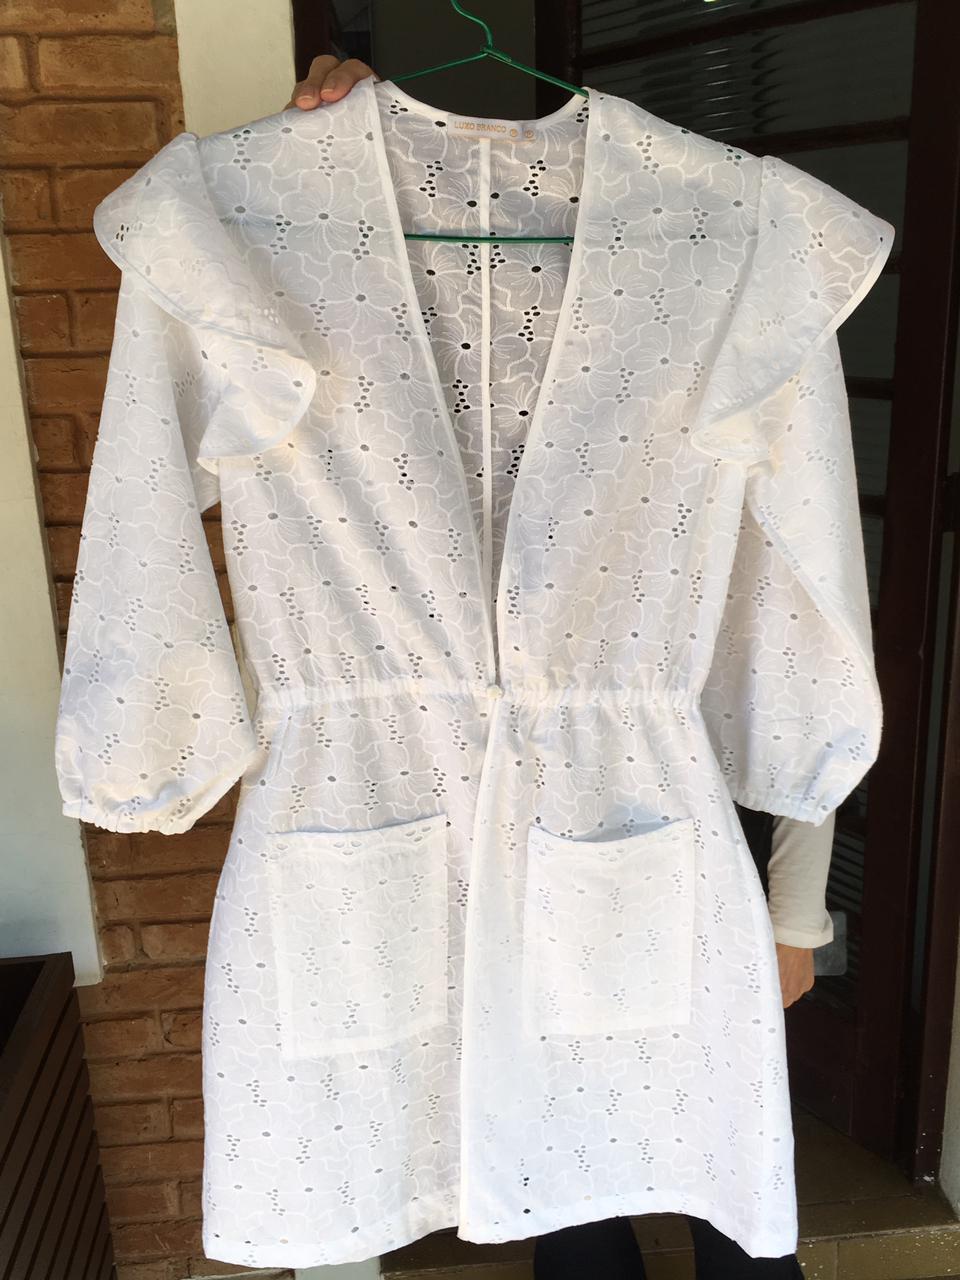 Jaleco Silvia  - Luxo Branco - Jalecos Personalizado Feminino